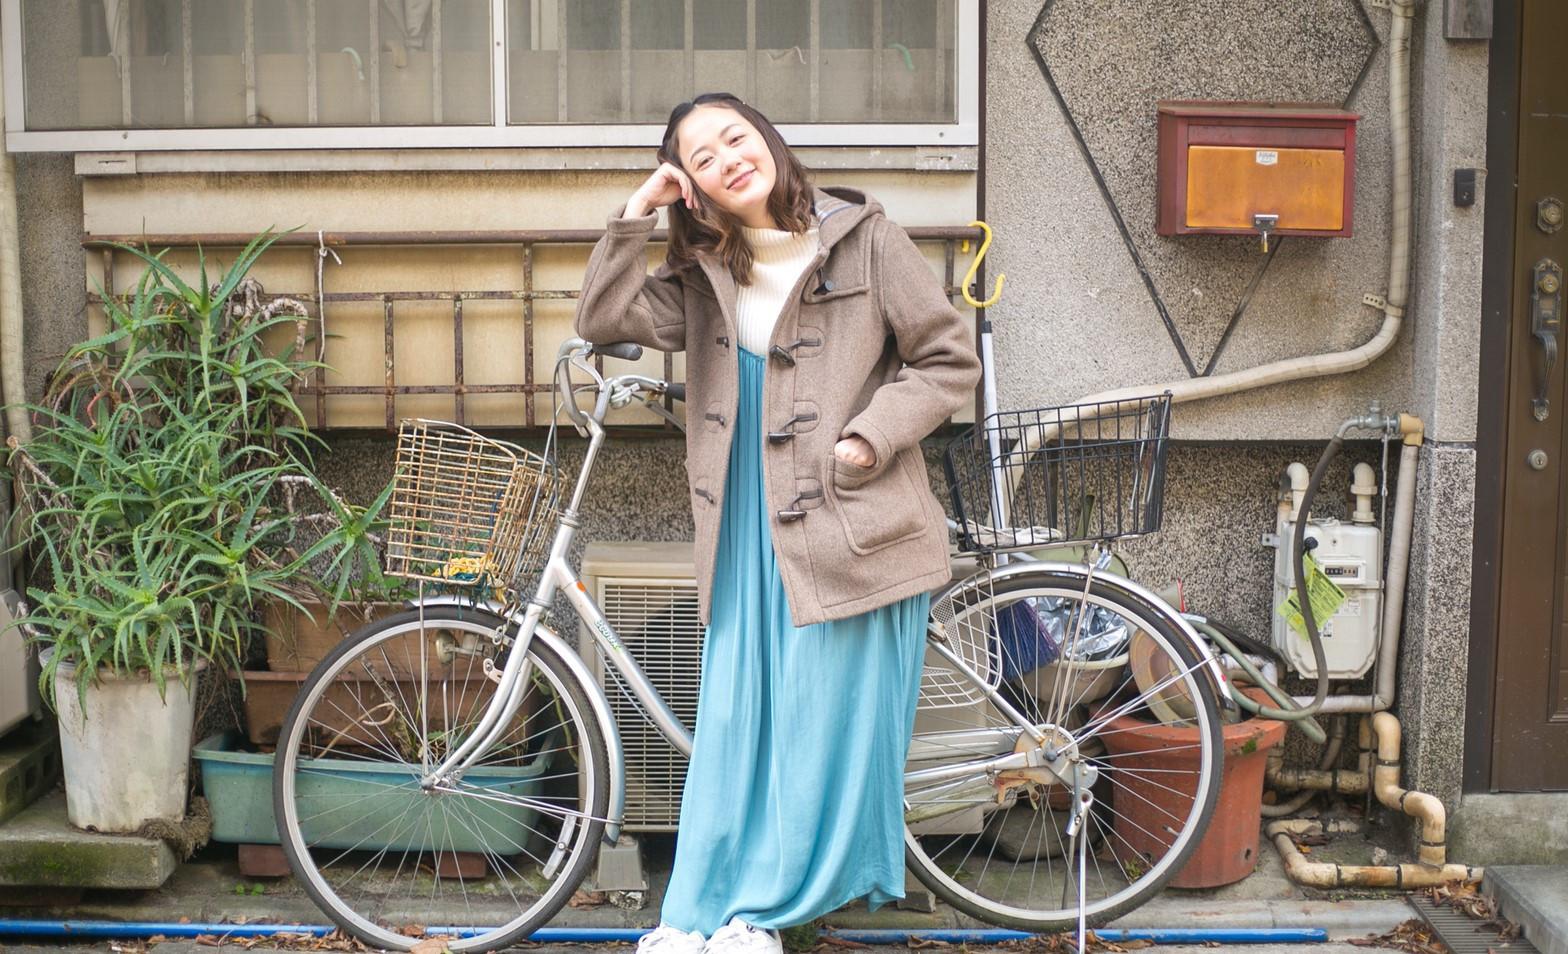 vol_21.01_200908.jpg